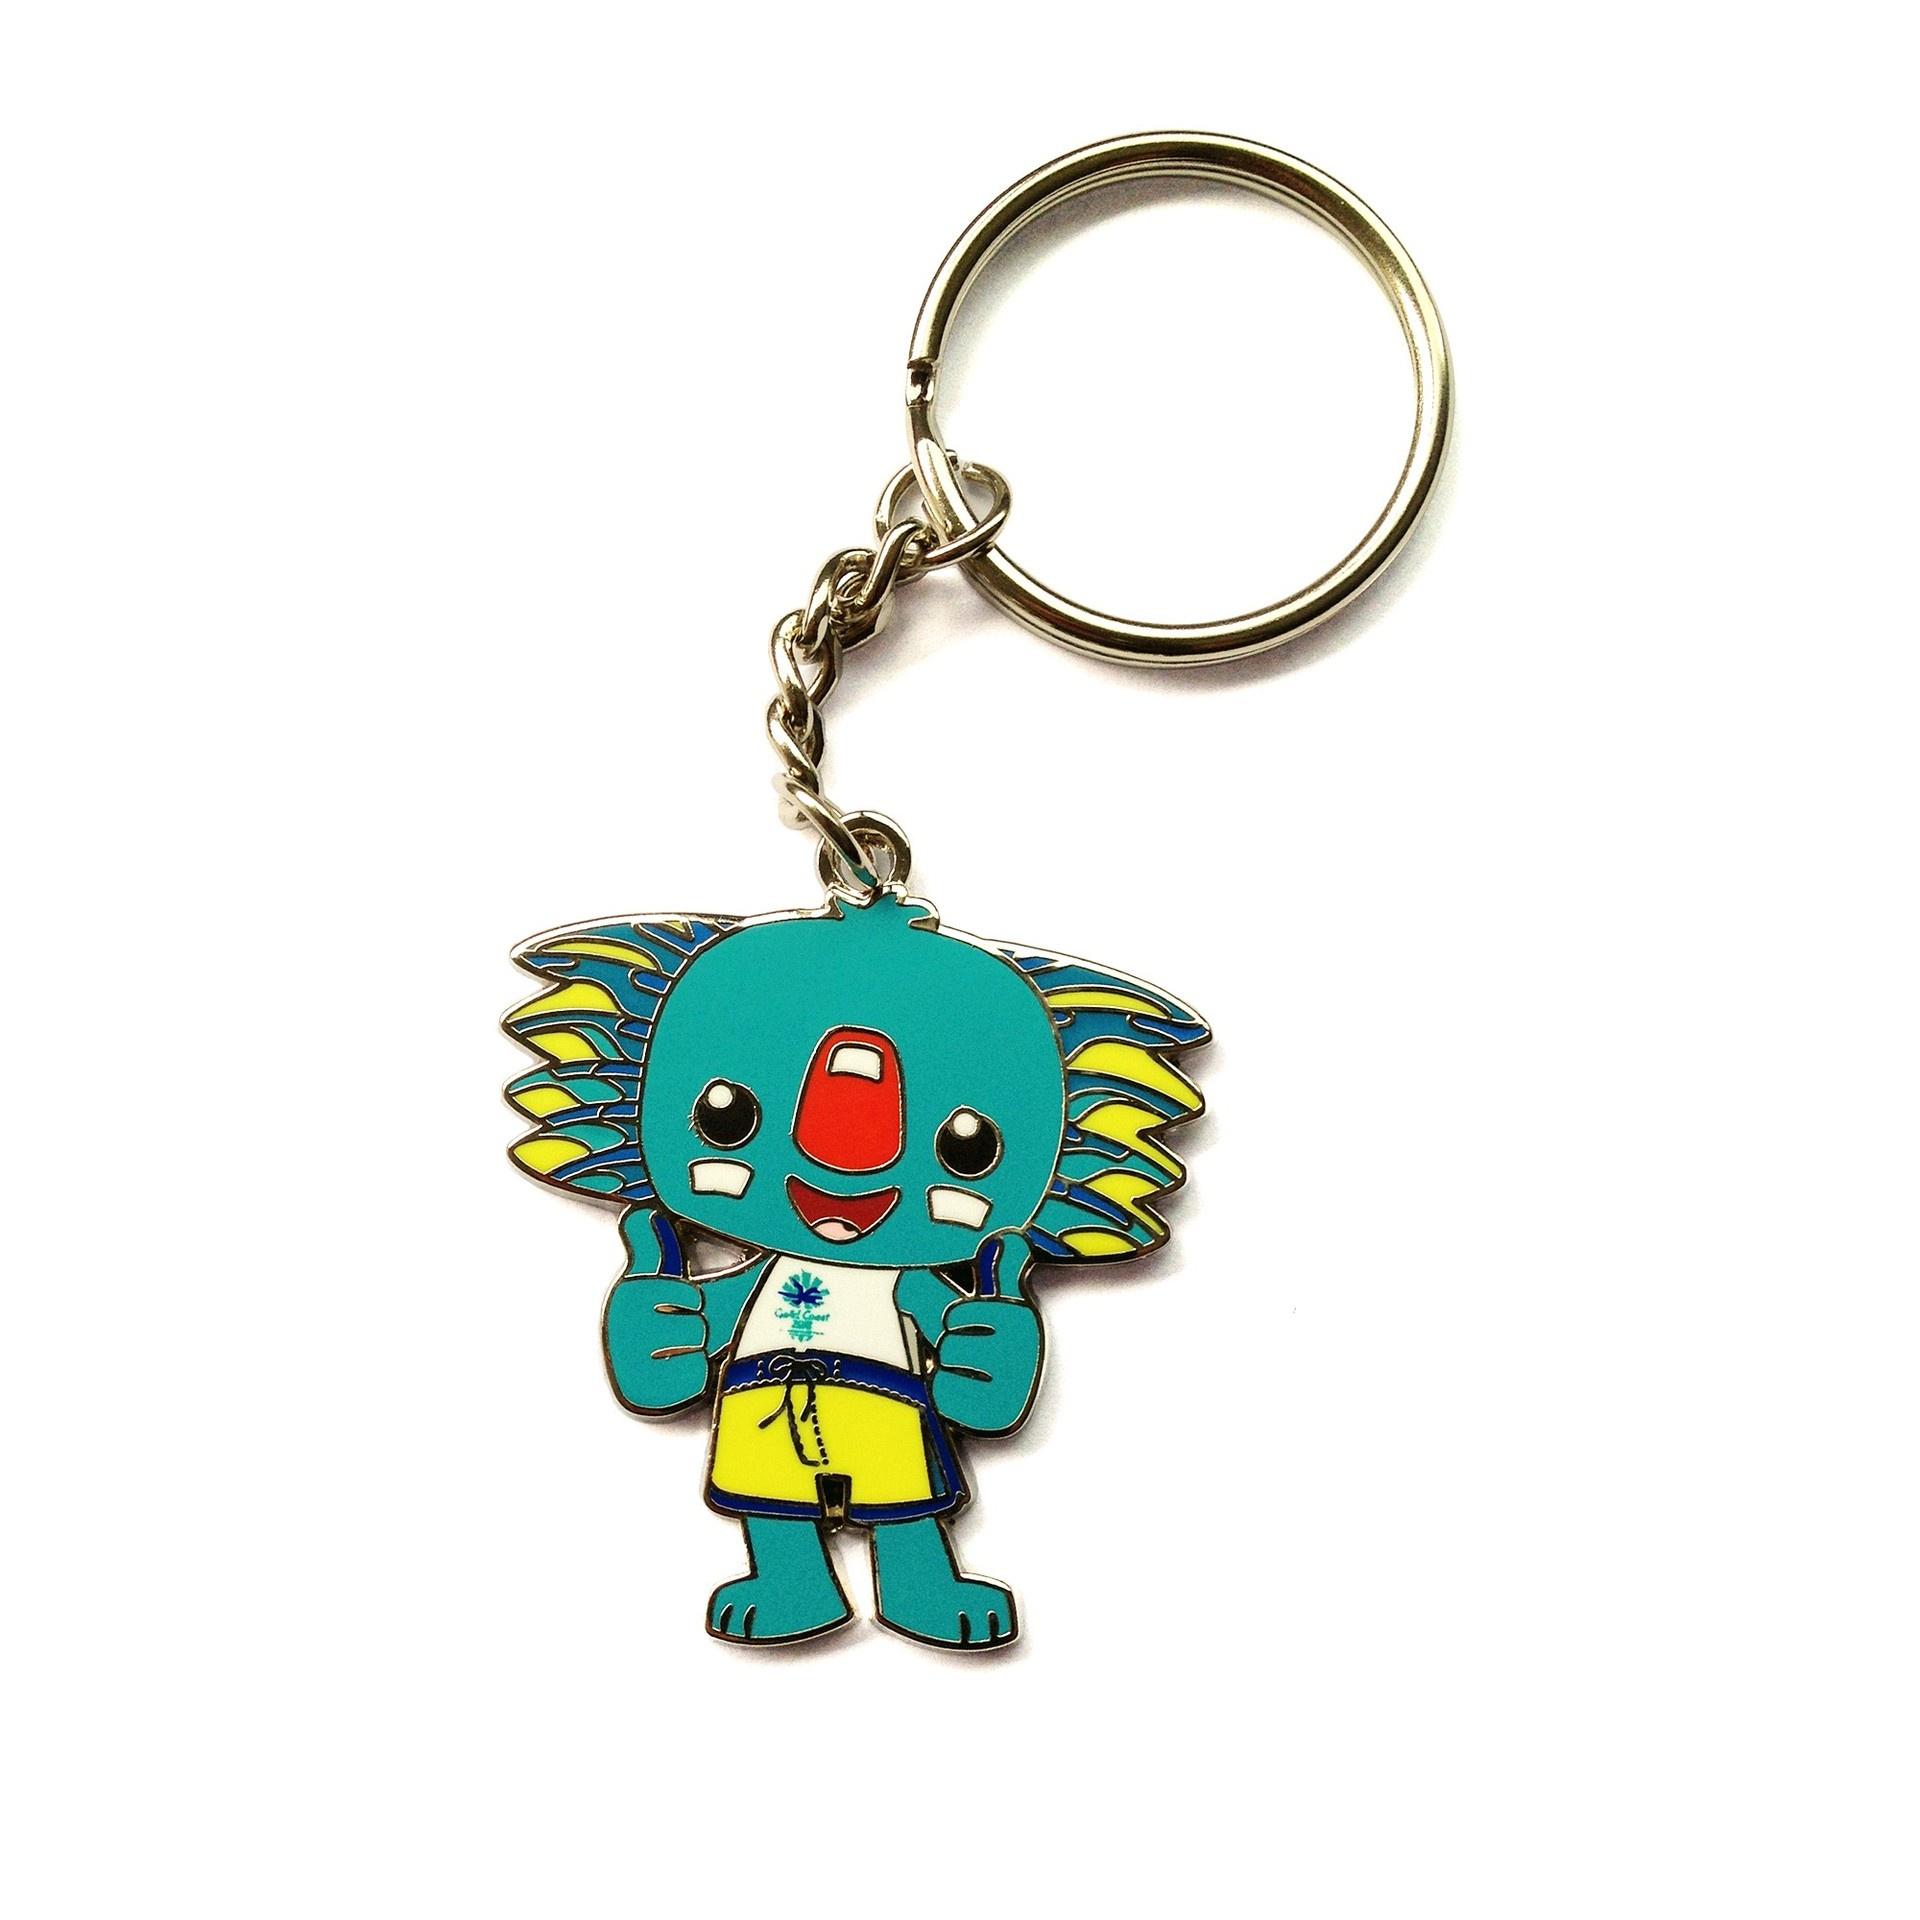 Borobi Mascot Metal and Enamel Keyring Image